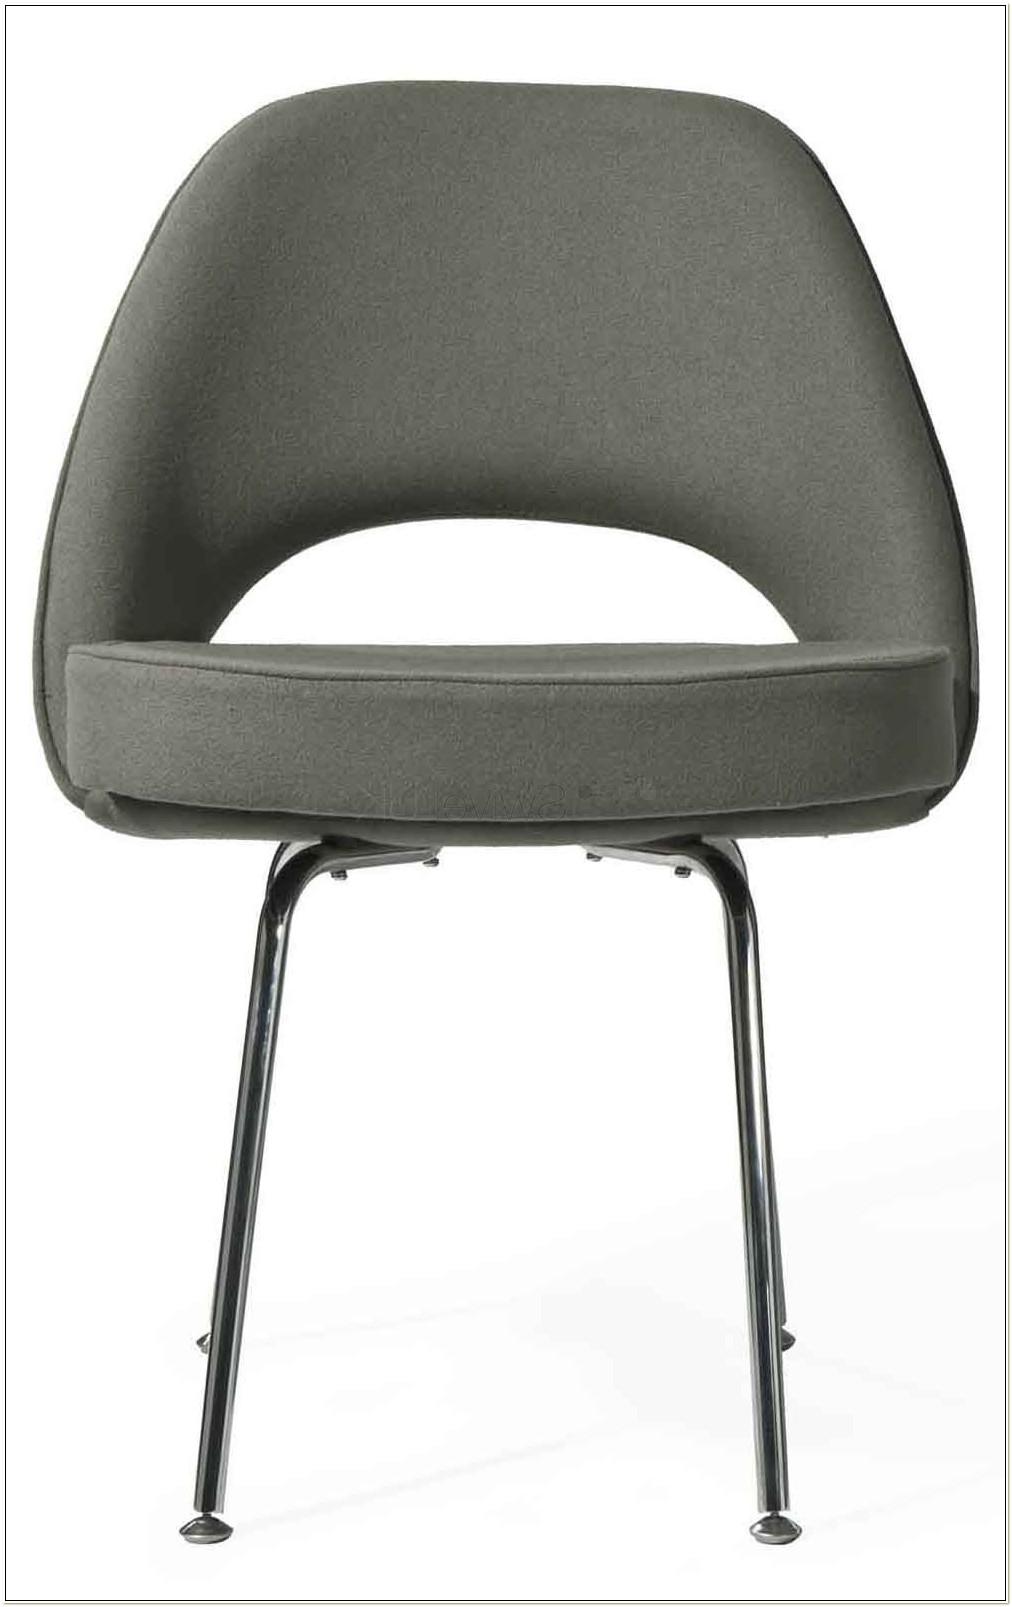 Saarinen Executive Chair Reproduction Uk